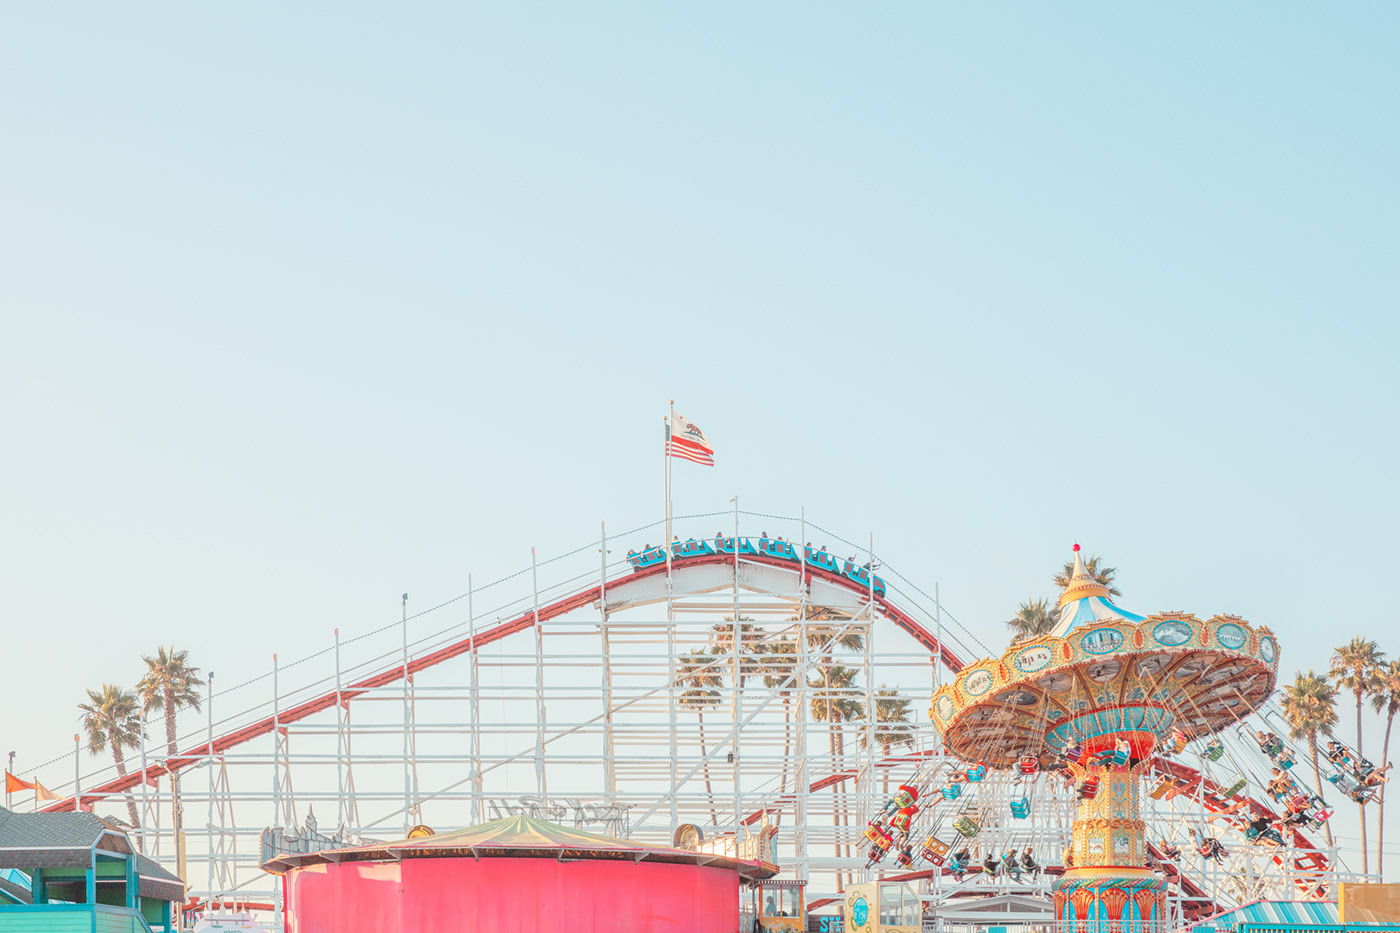 Santa Cruz Amusement Park by Ludwig Favre